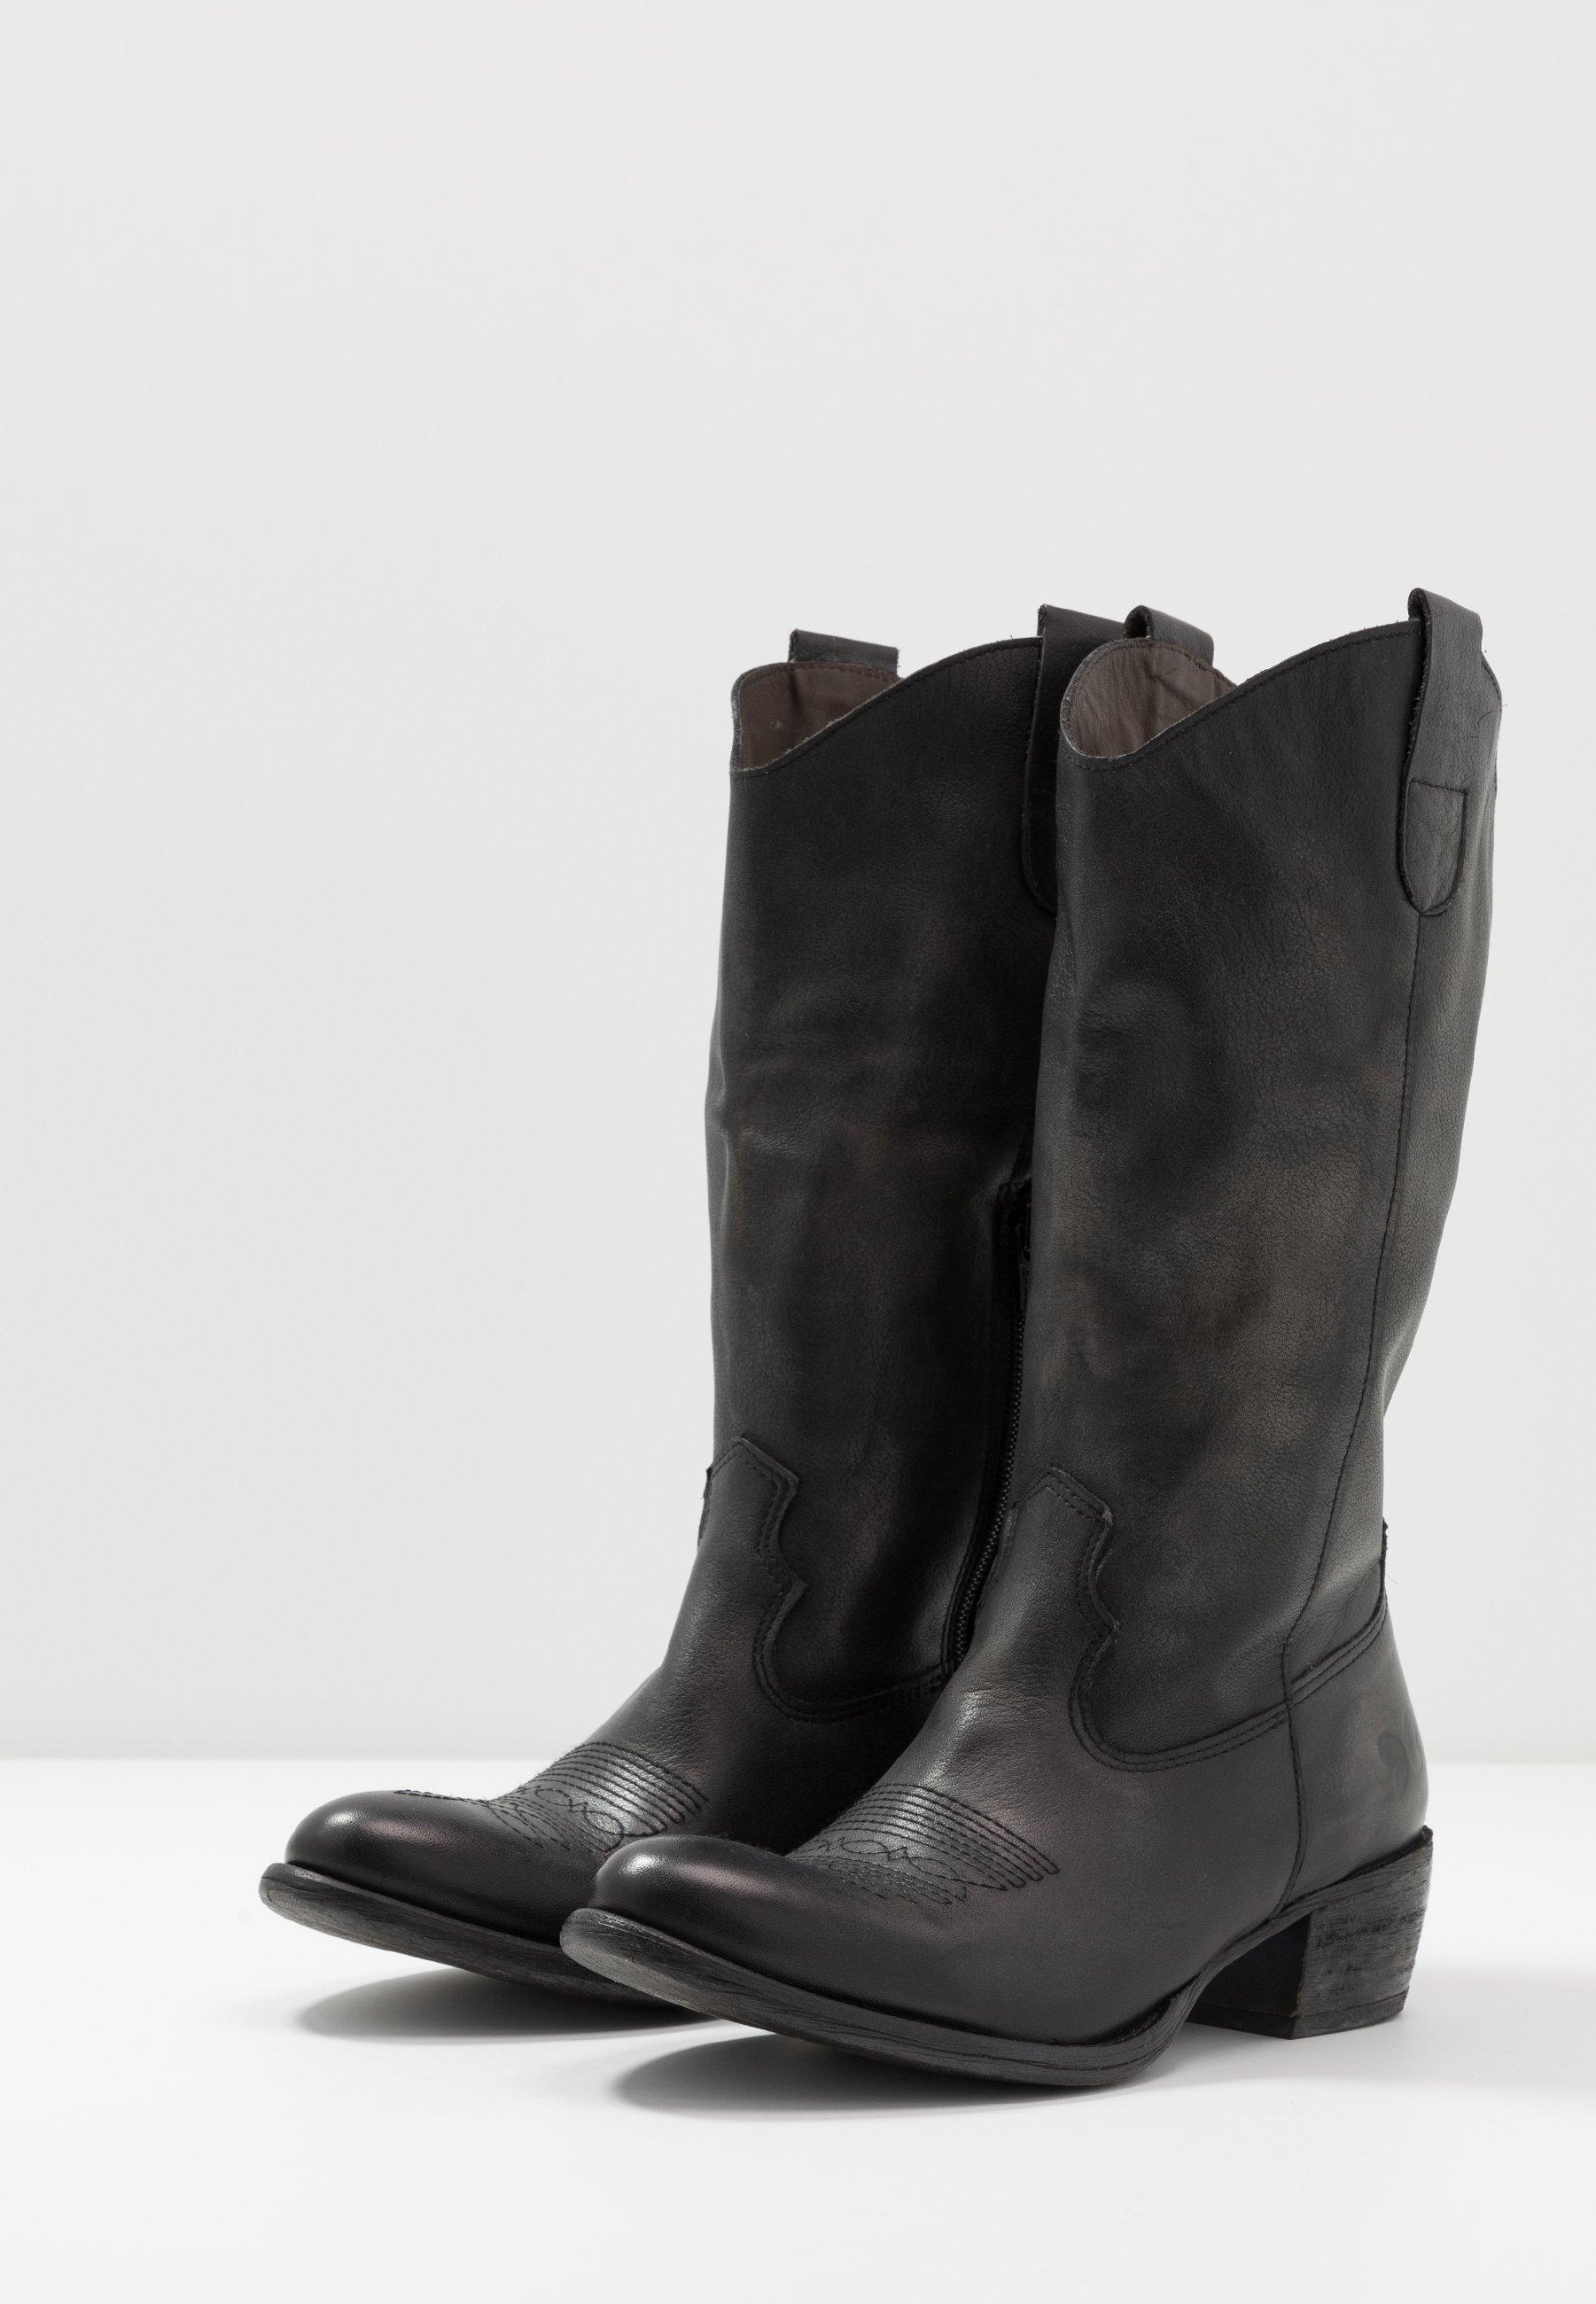 Recommend Cheap Drop Shipping Women's Shoes Felmini Cowboy/Biker boots lavado rjqmwLyOG Fzmj5nHrh